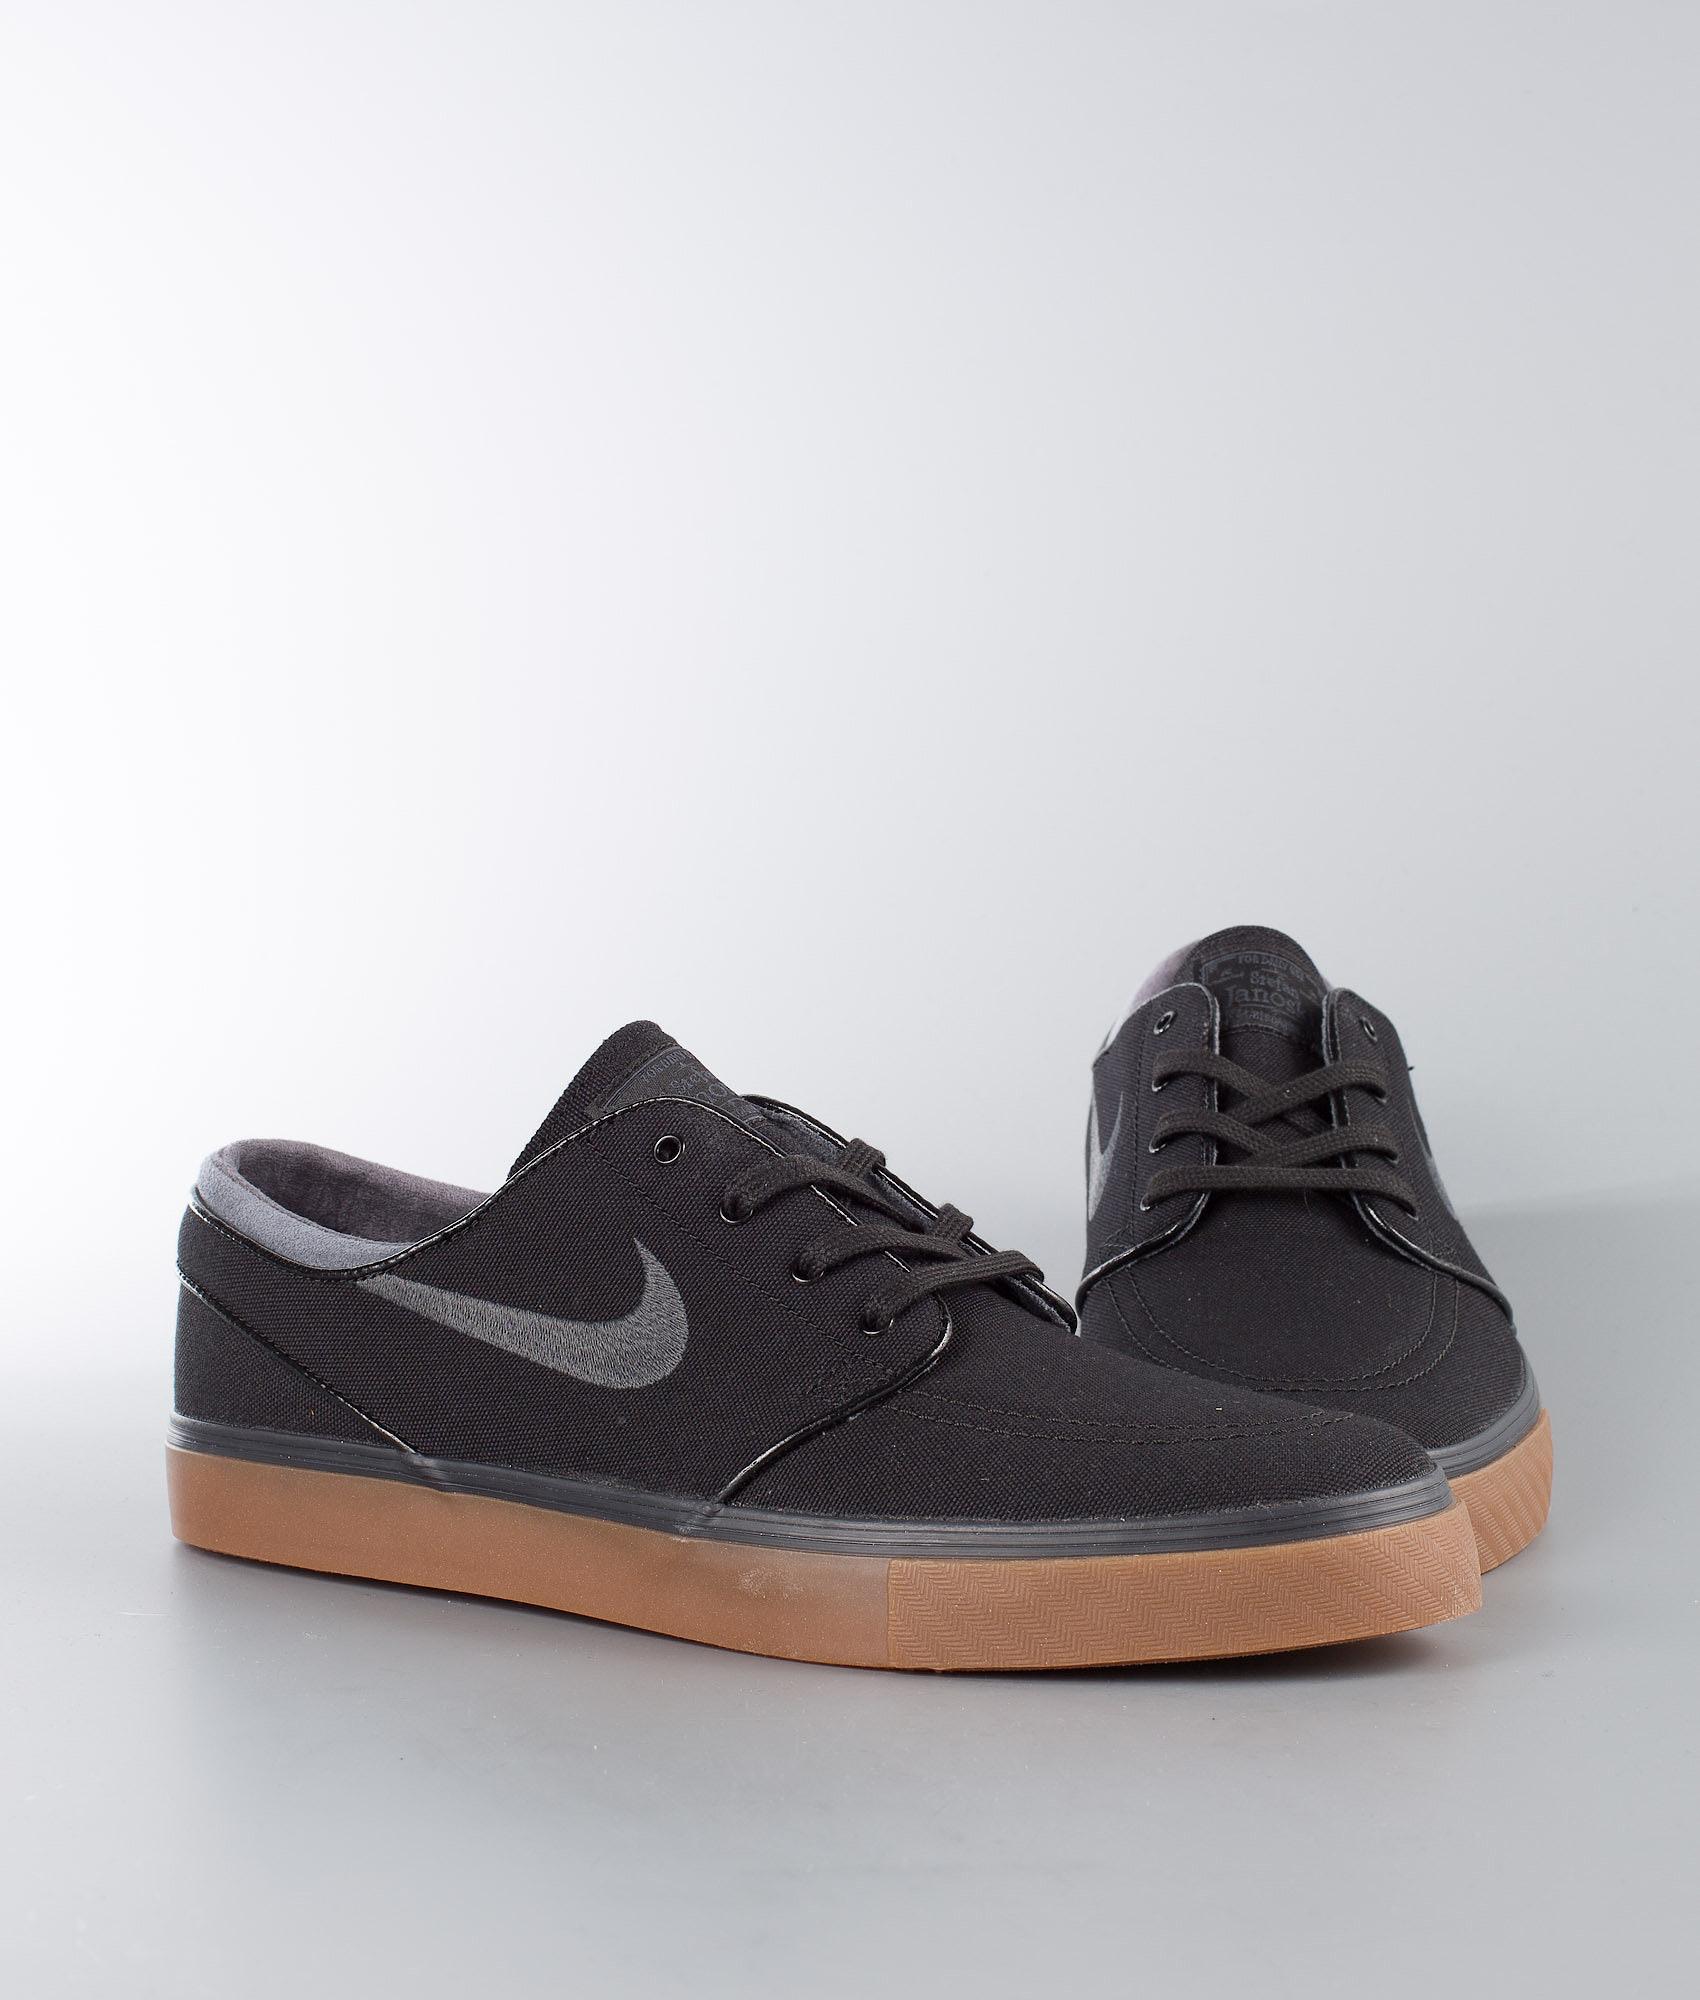 e49a27dc1b0 Nike Zoom Stefan Janoski Cnvs Shoes Black Anthracite-Gum Med Brown ...